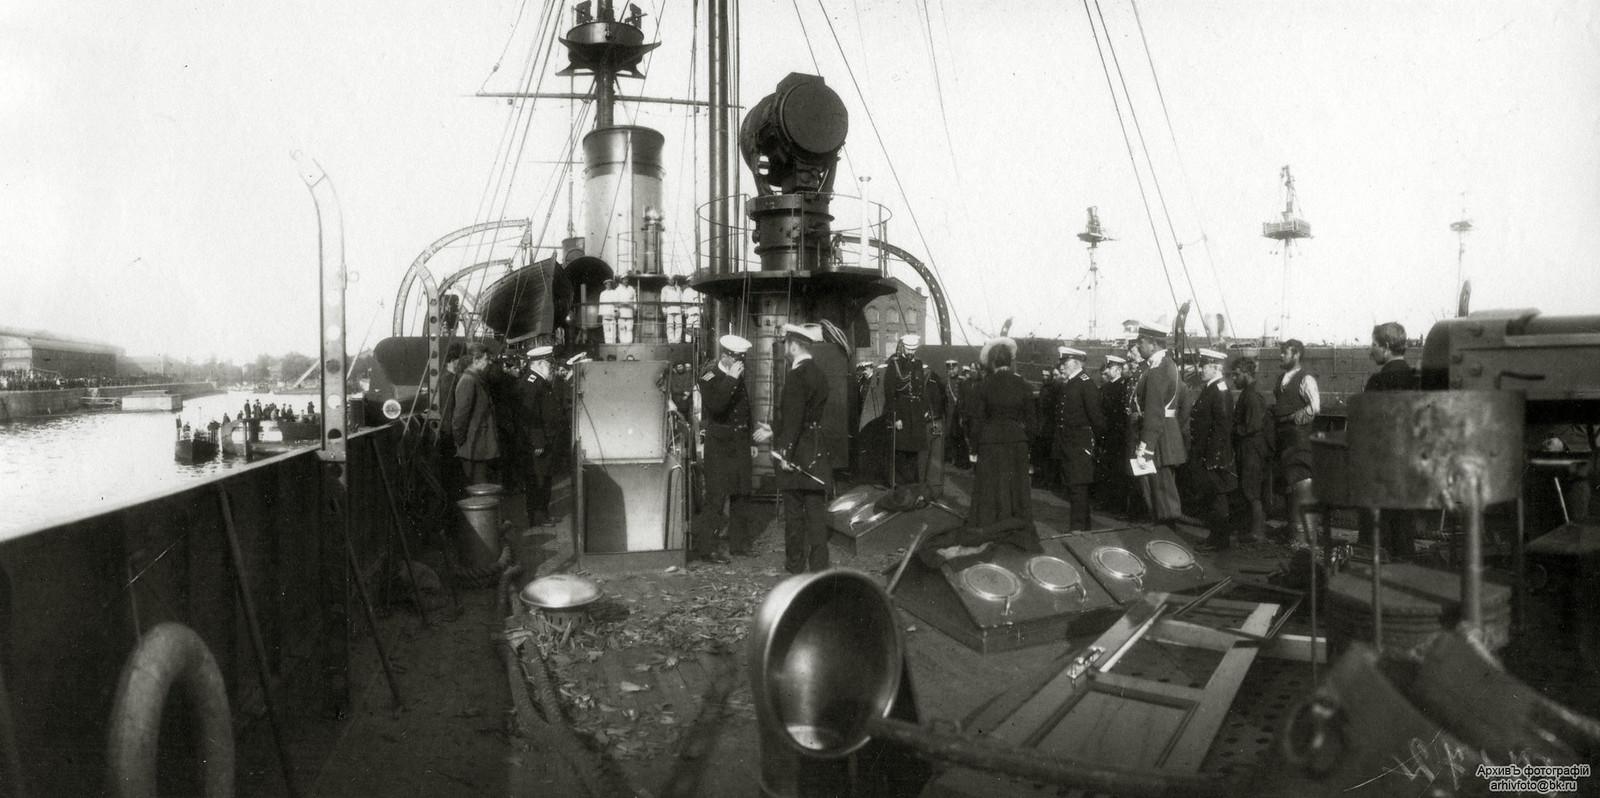 1904. Бронепалубный крейсер II-го ранга «Жемчуг»